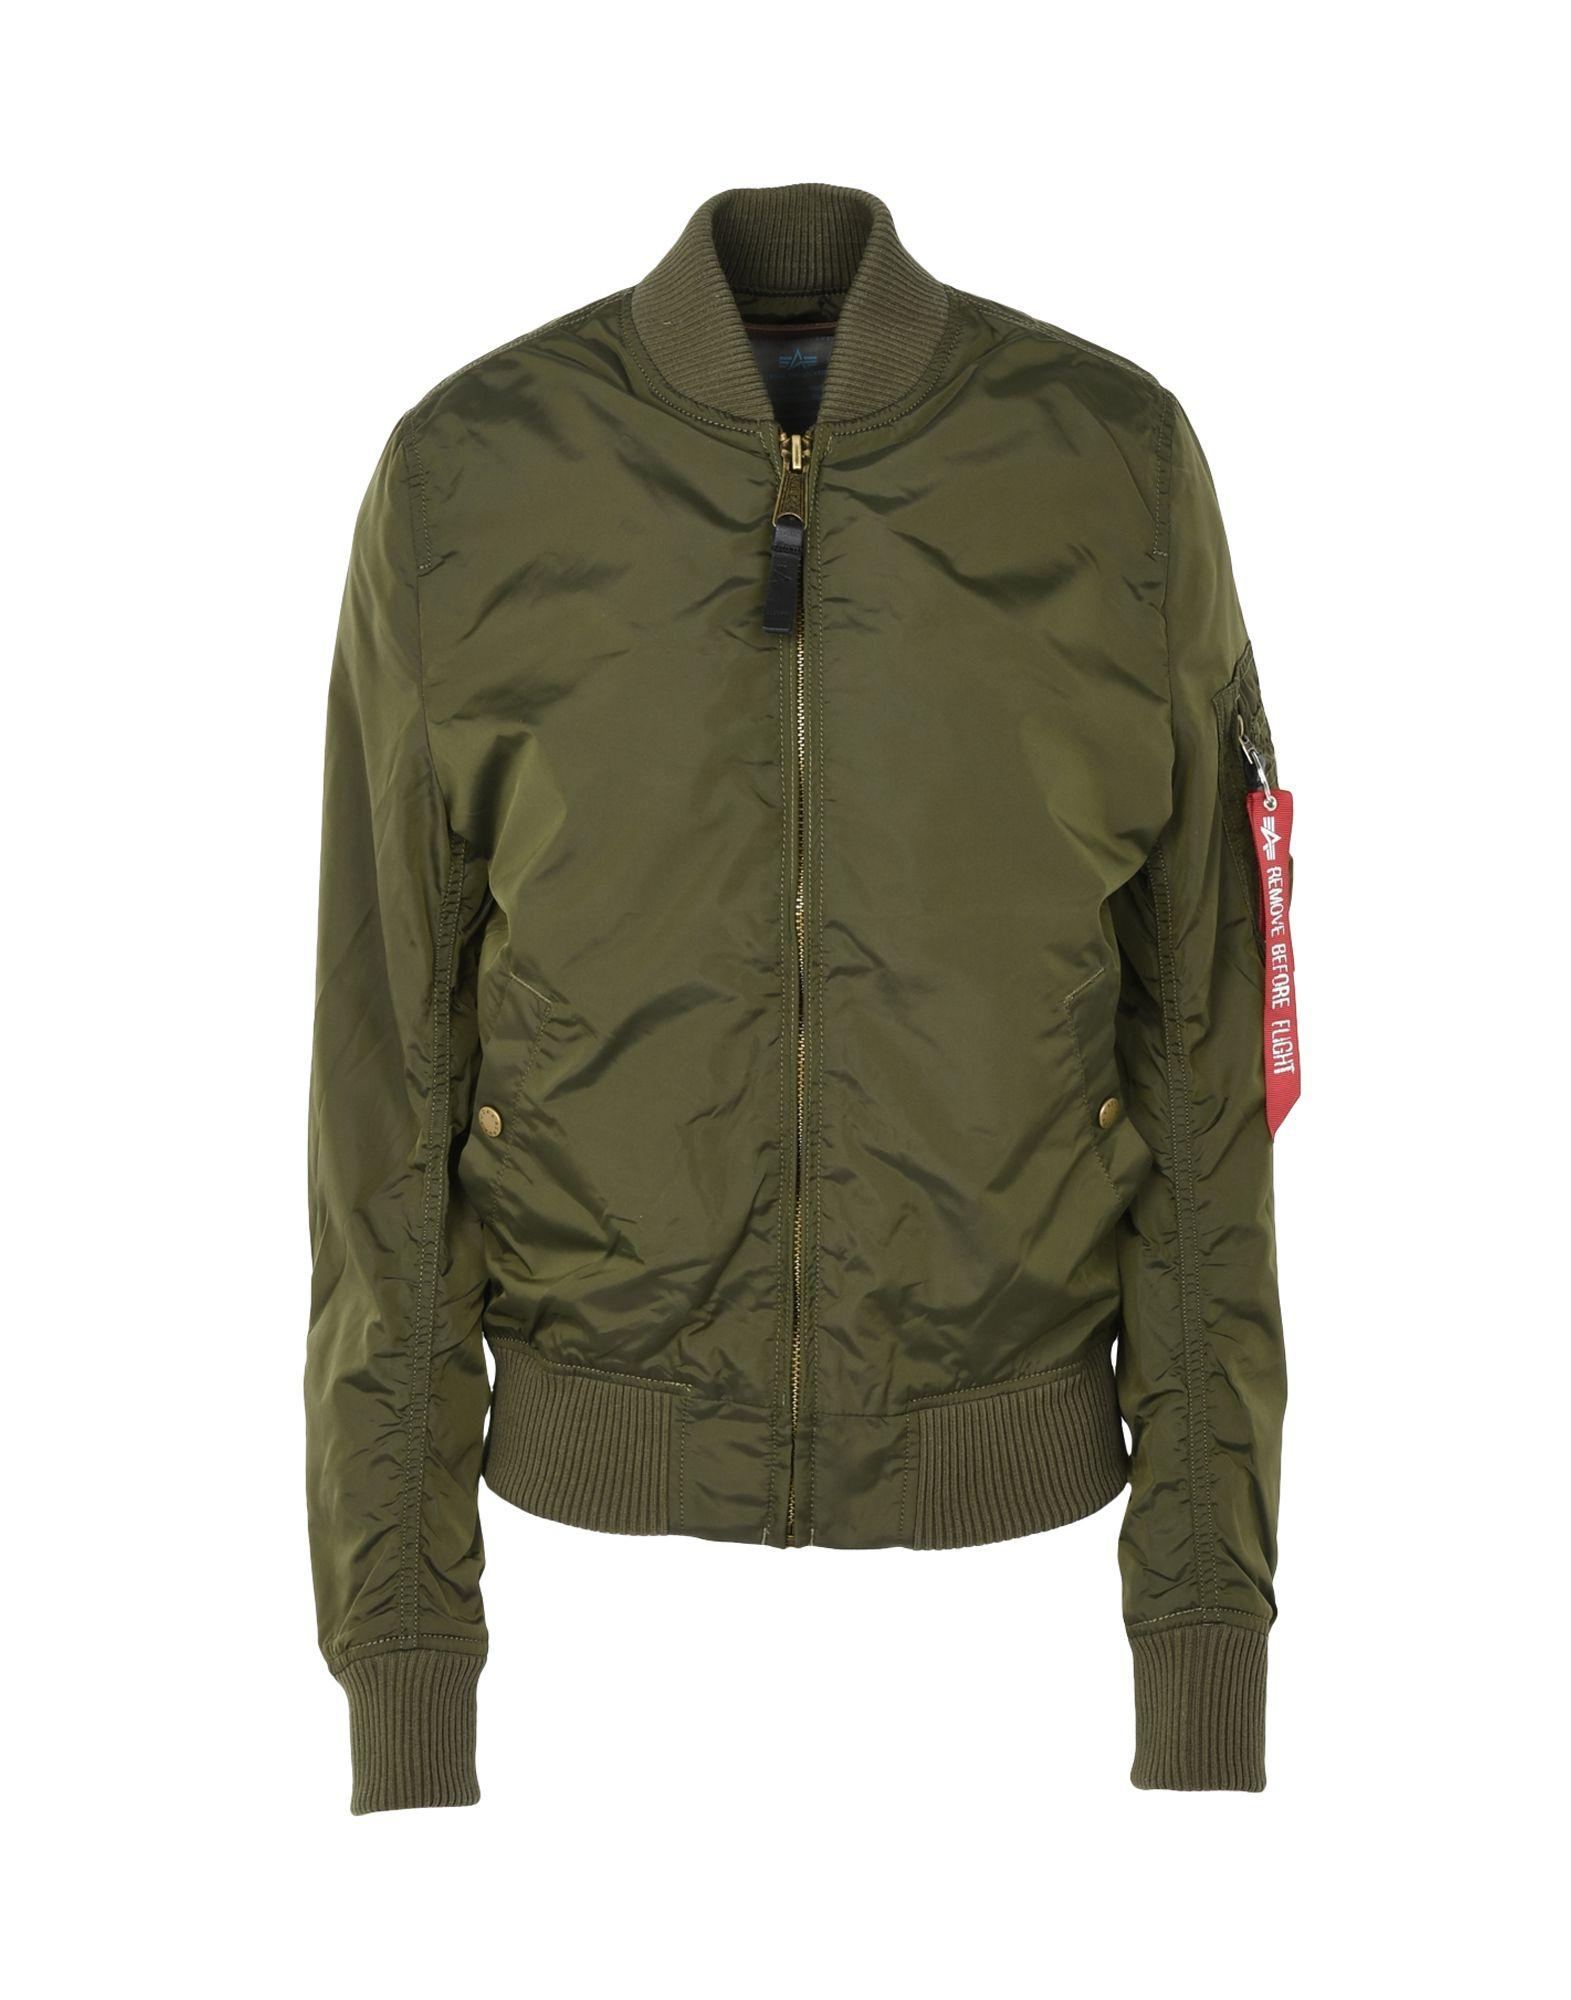 ALPHA INDUSTRIES INC. Damen Jacke Farbe Militärgrün Größe 3